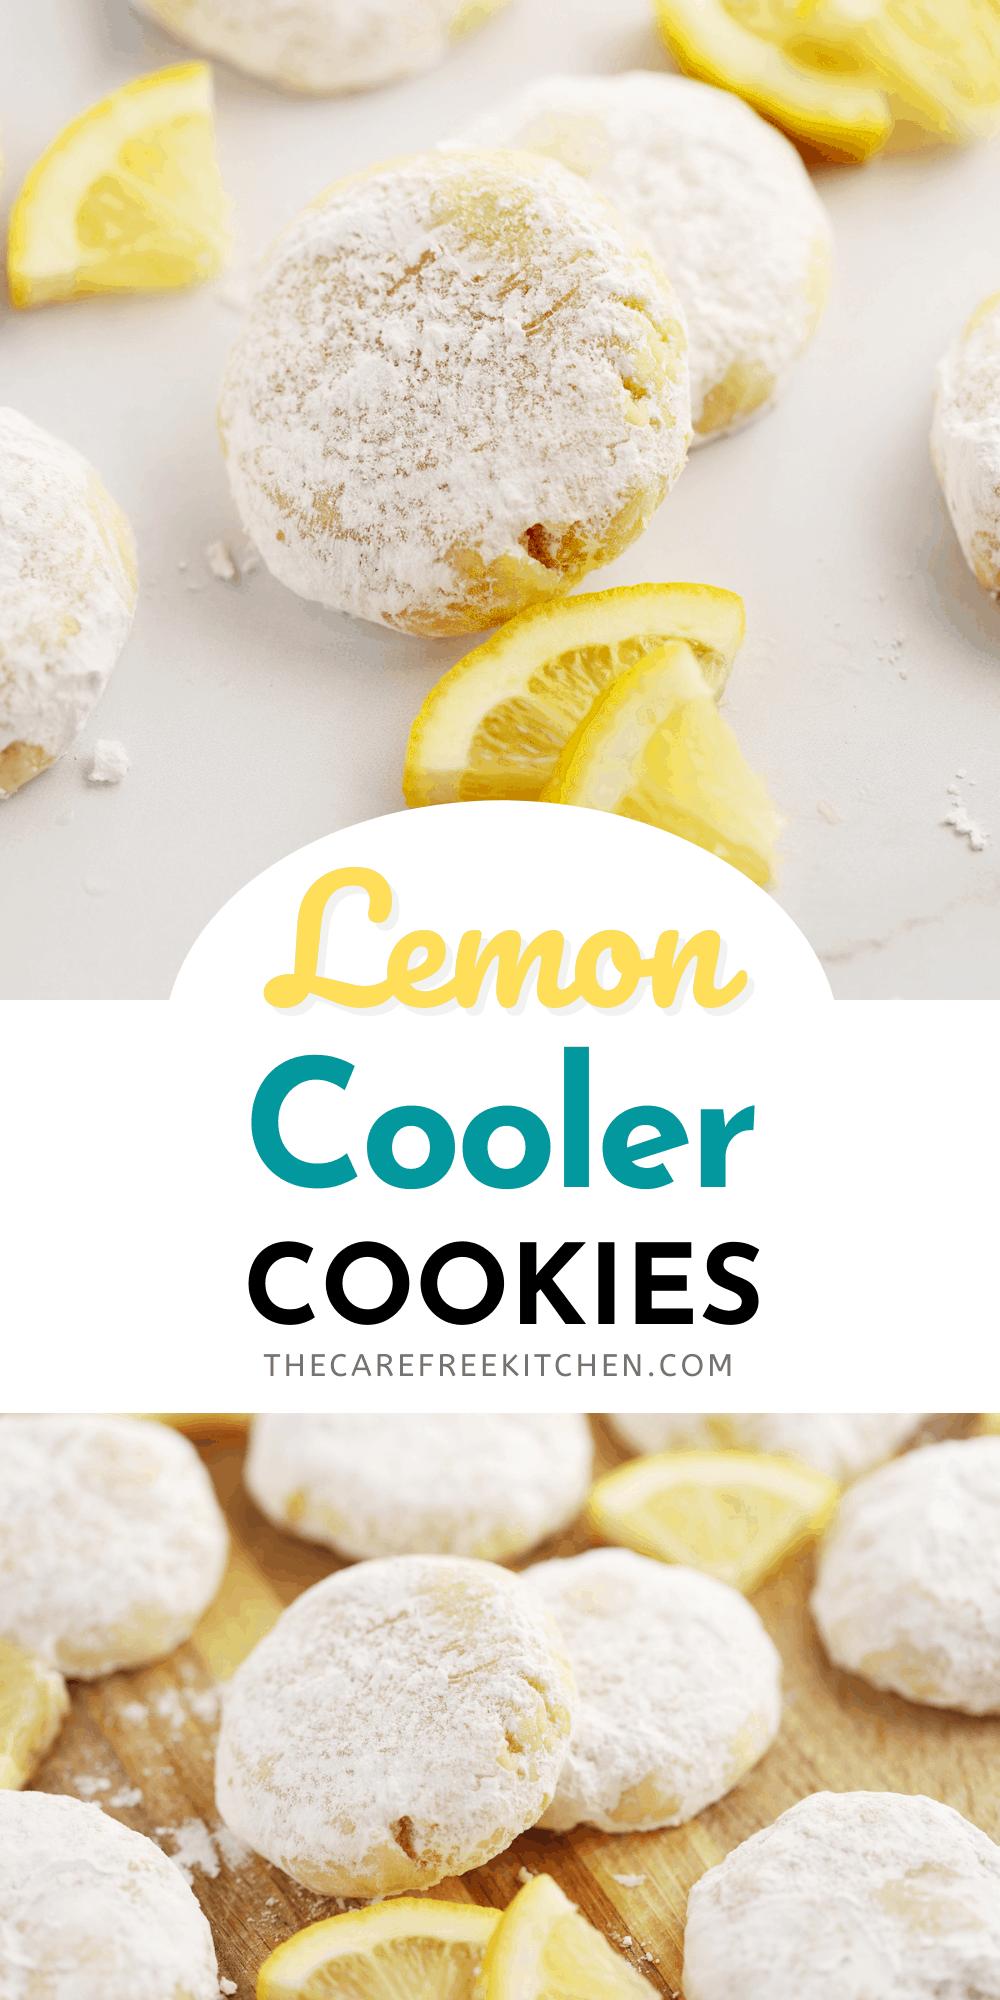 Pinterest pin for Lemon Cooler Cookies